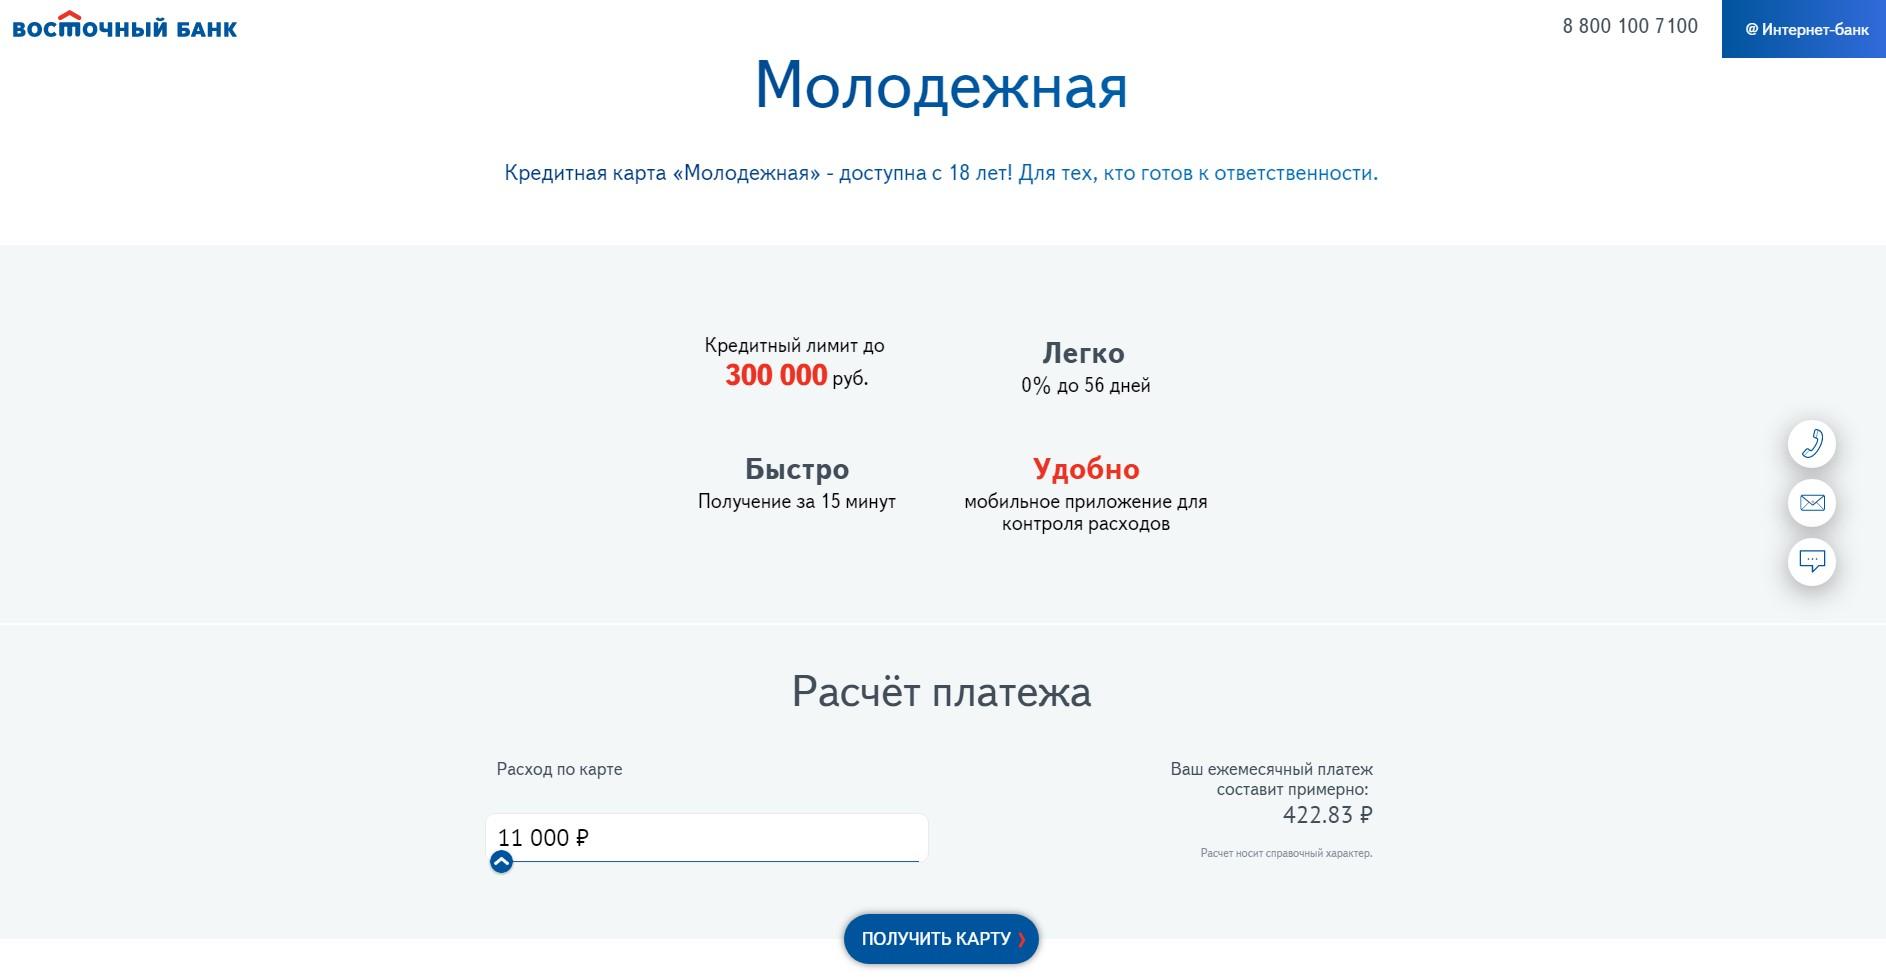 Информация по карте и калькулятор расчёта платежа